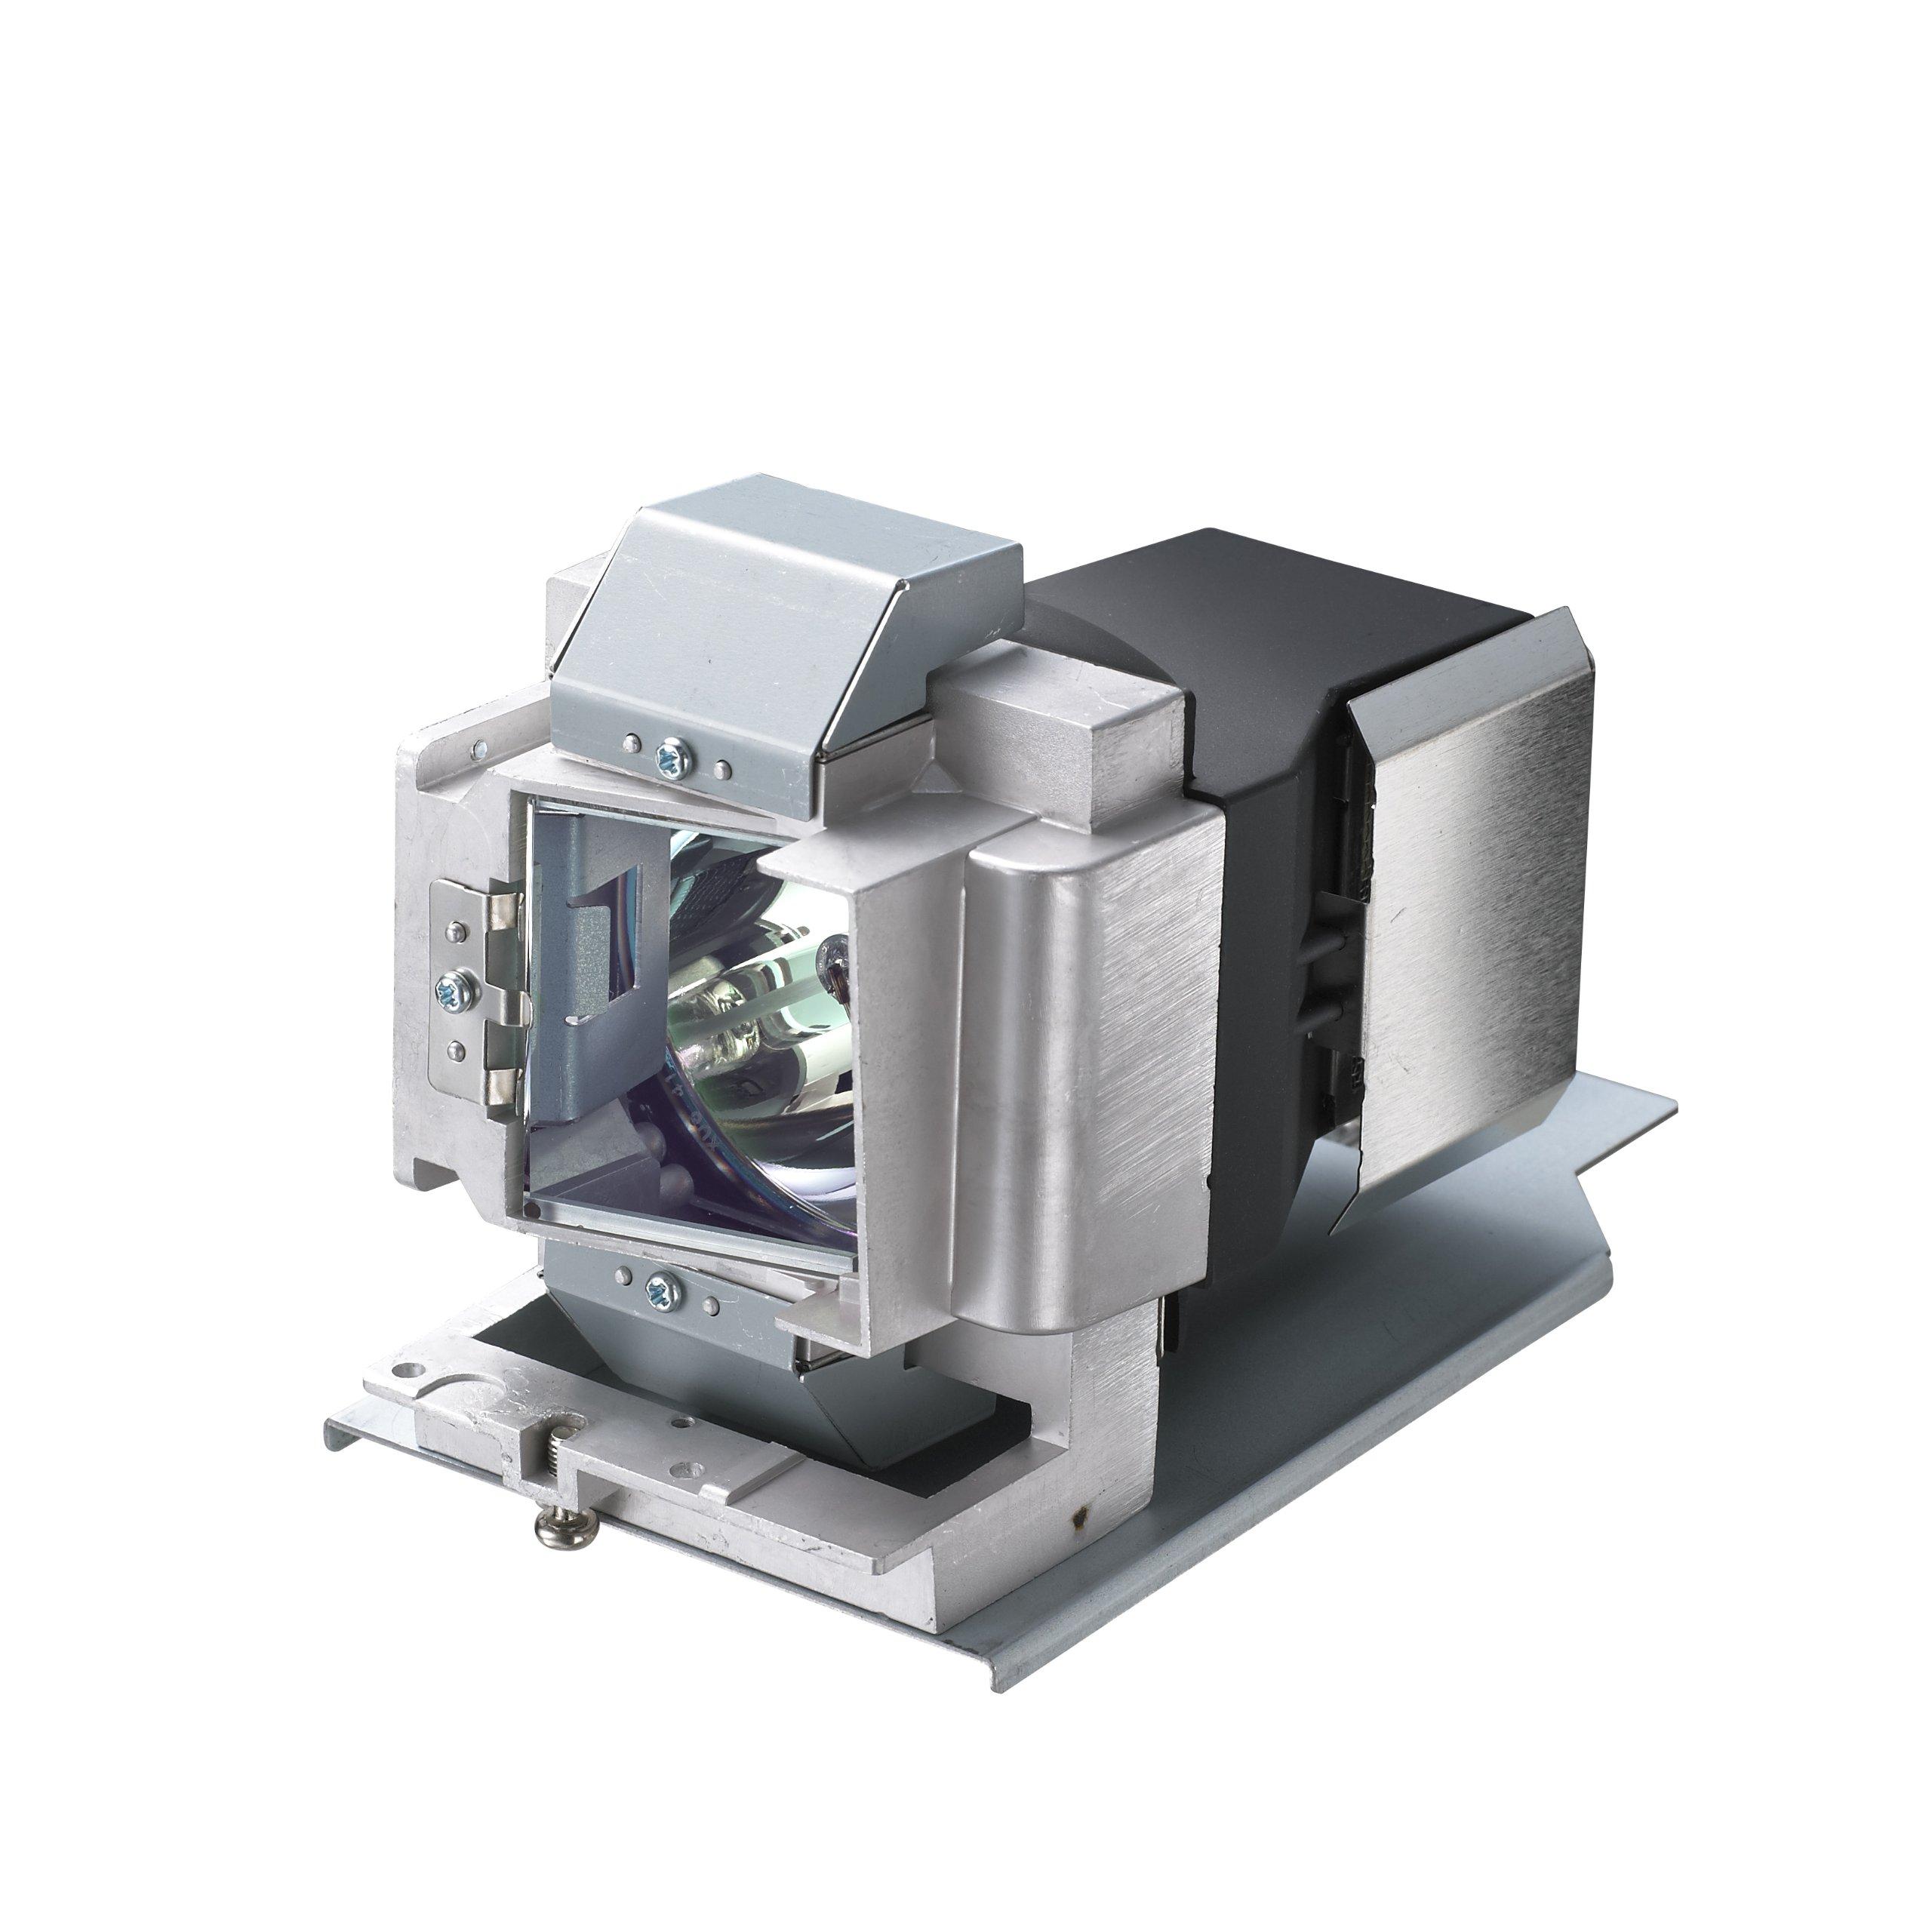 Vivitek 5811116320-S 180-Watt Replacement Lamp for D510, D511, D508 and D509 by Vivitek